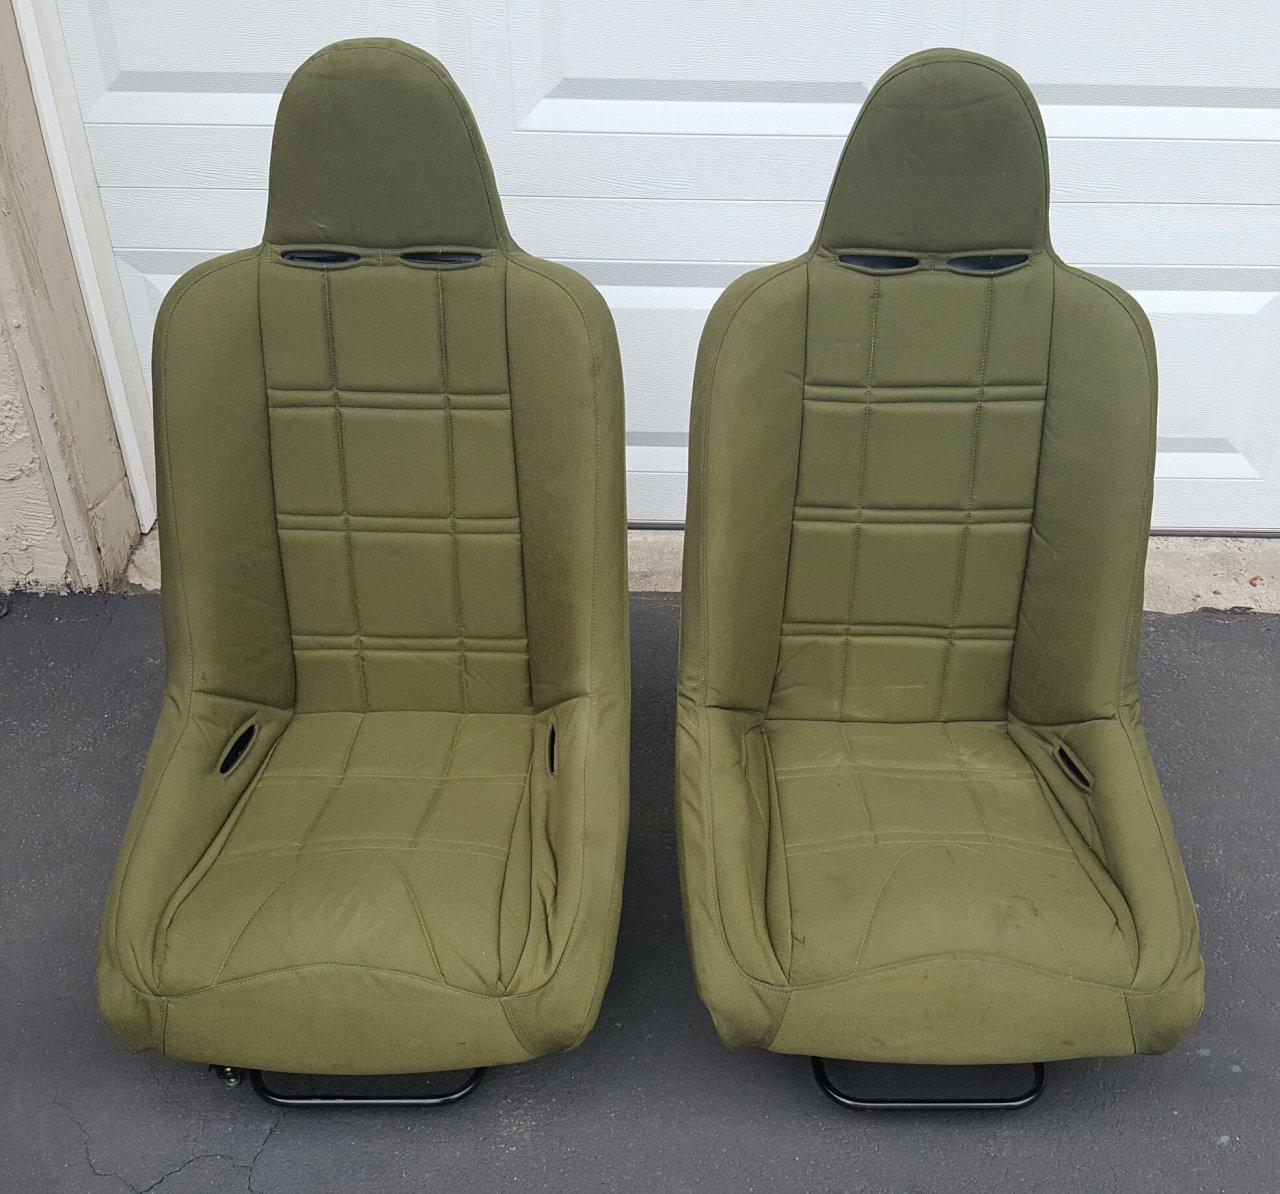 For Sale - Mastercraft Military Suspension Seats   IH8MUD Forum